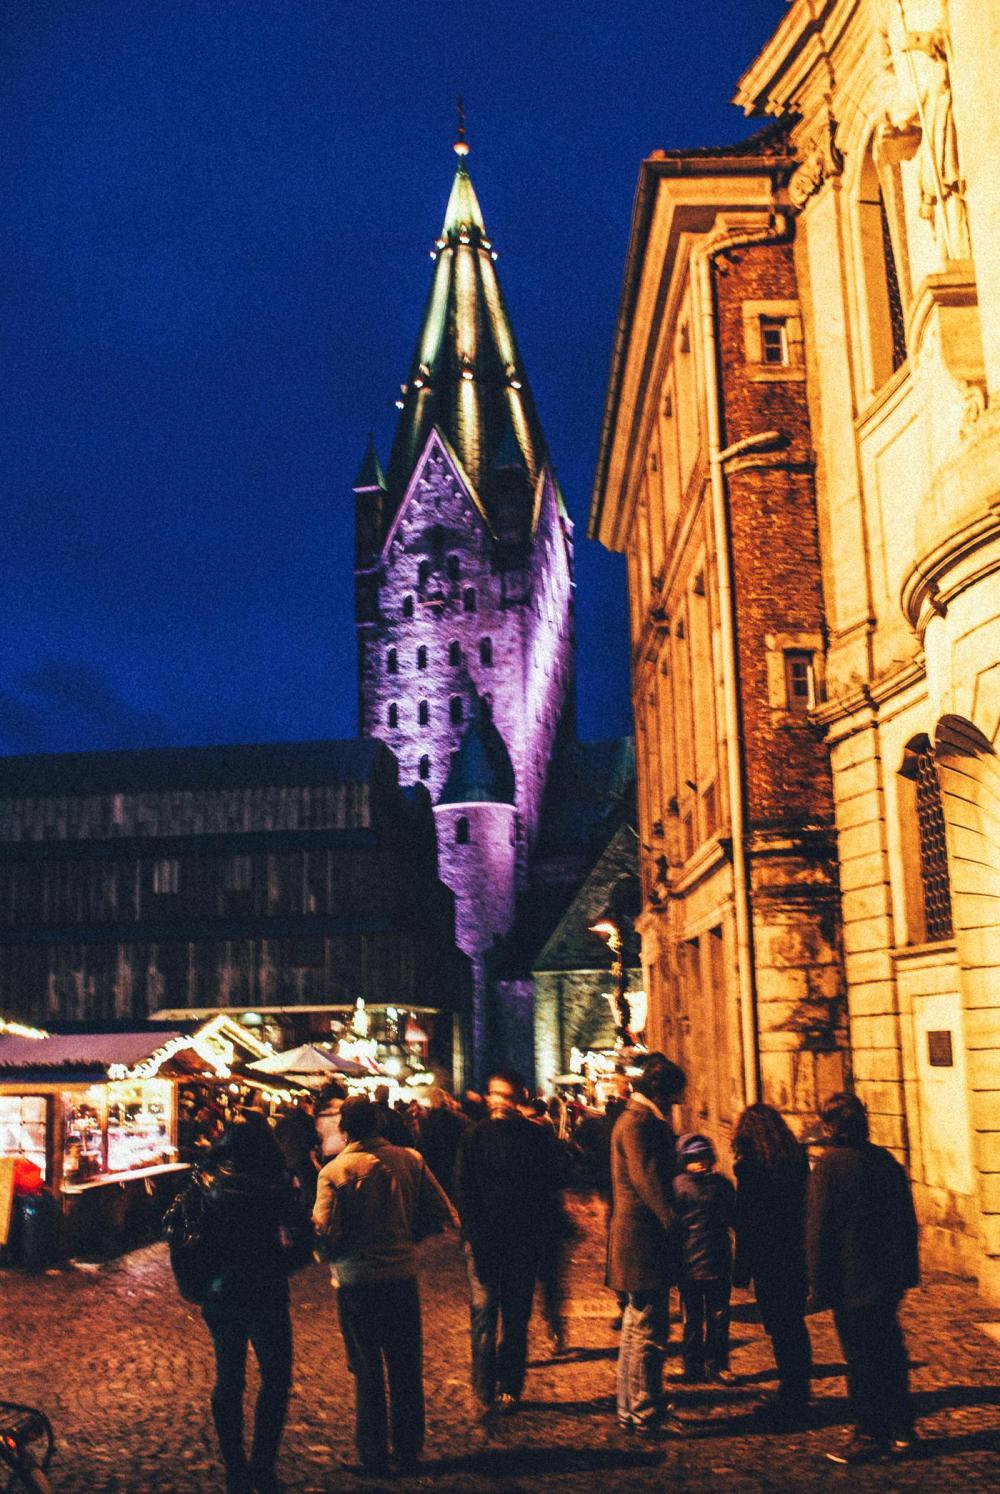 German Christmas Market, Winter (8)